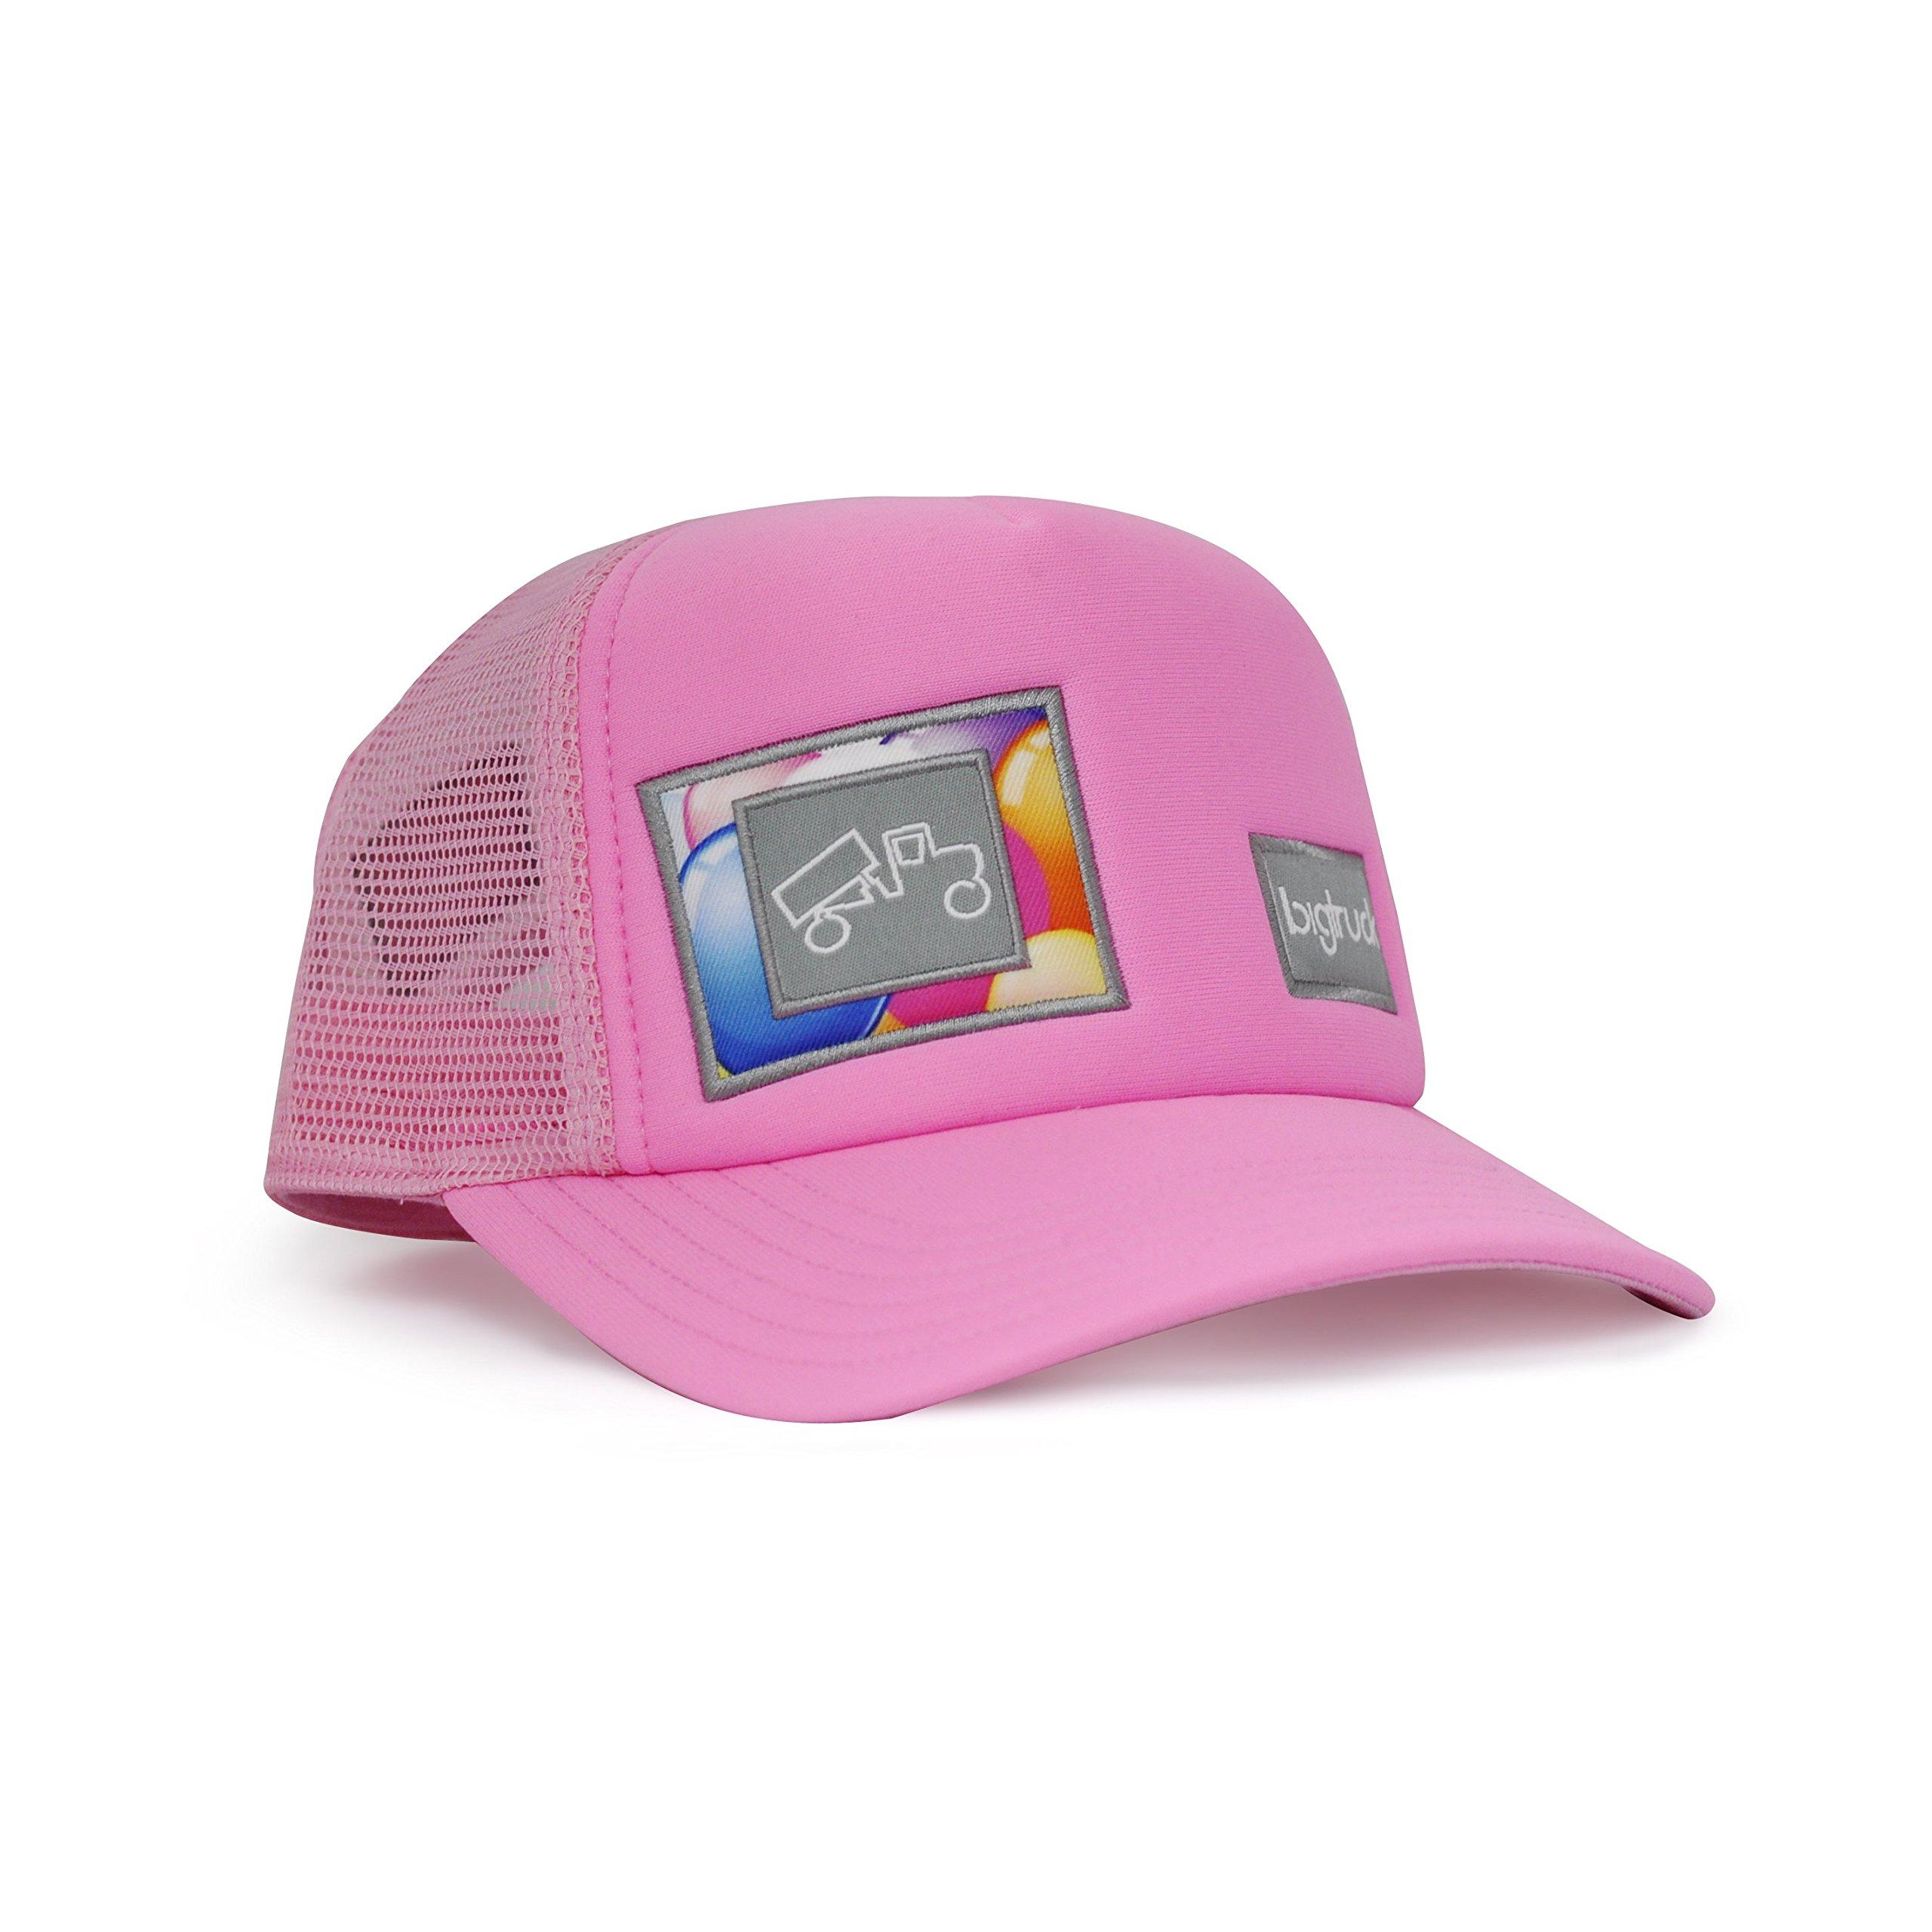 bigtruck Original Toddler Mesh Snapback Toddler Trucker Hat, Pink